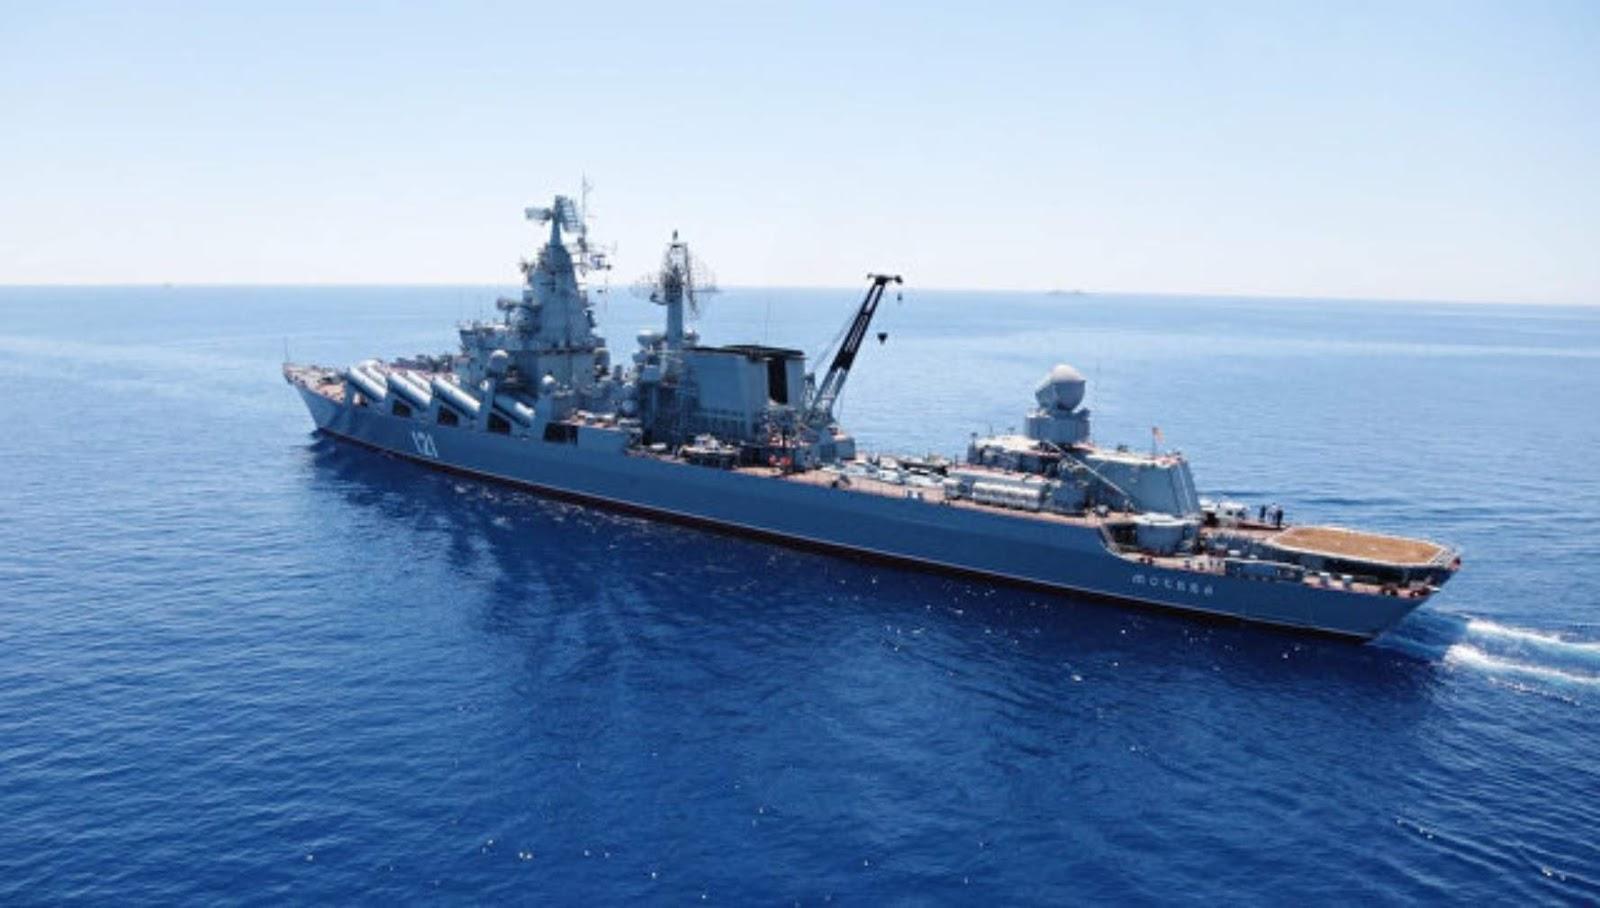 Harapan AS latihan Rusia di Laut Mediterania aman dan profesional